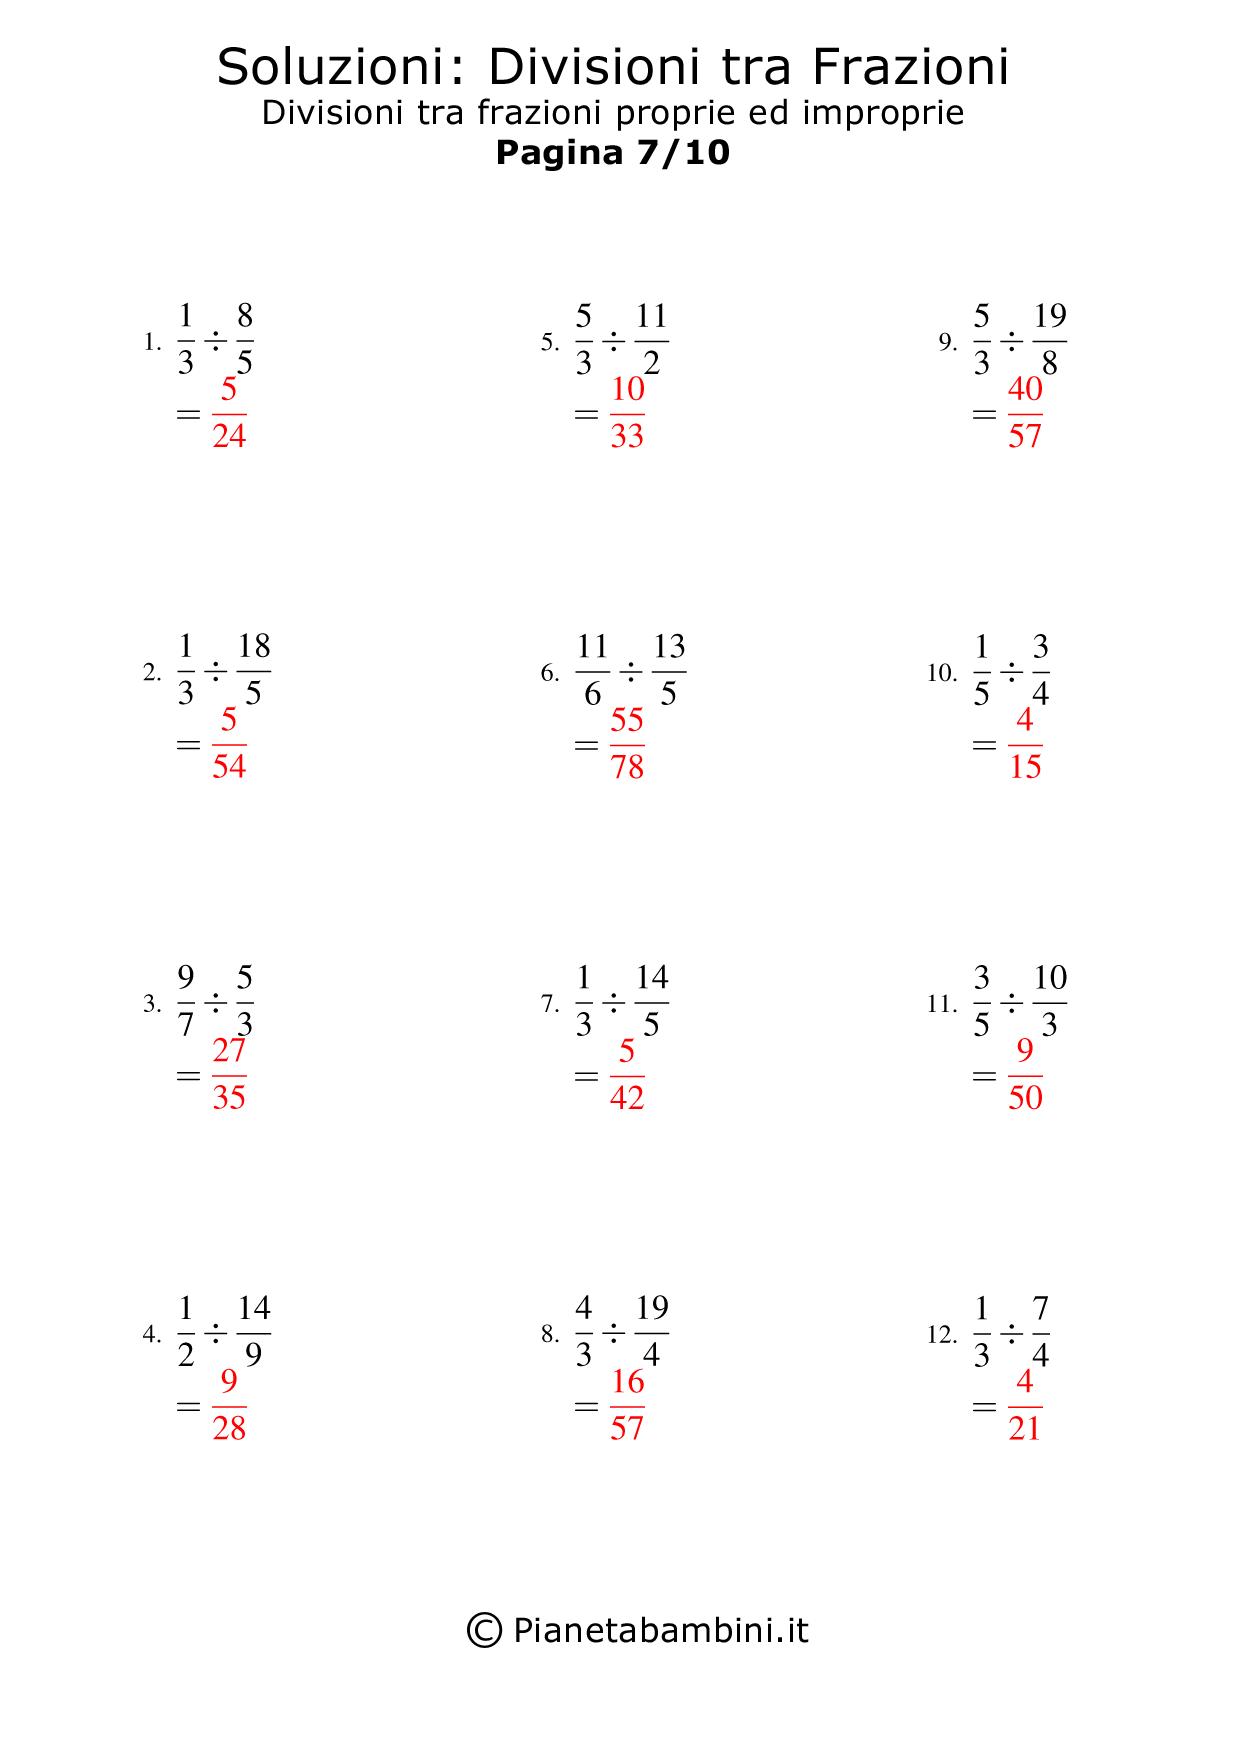 Soluzioni-Divisioni-Frazioni-Proprie-Improprie_07